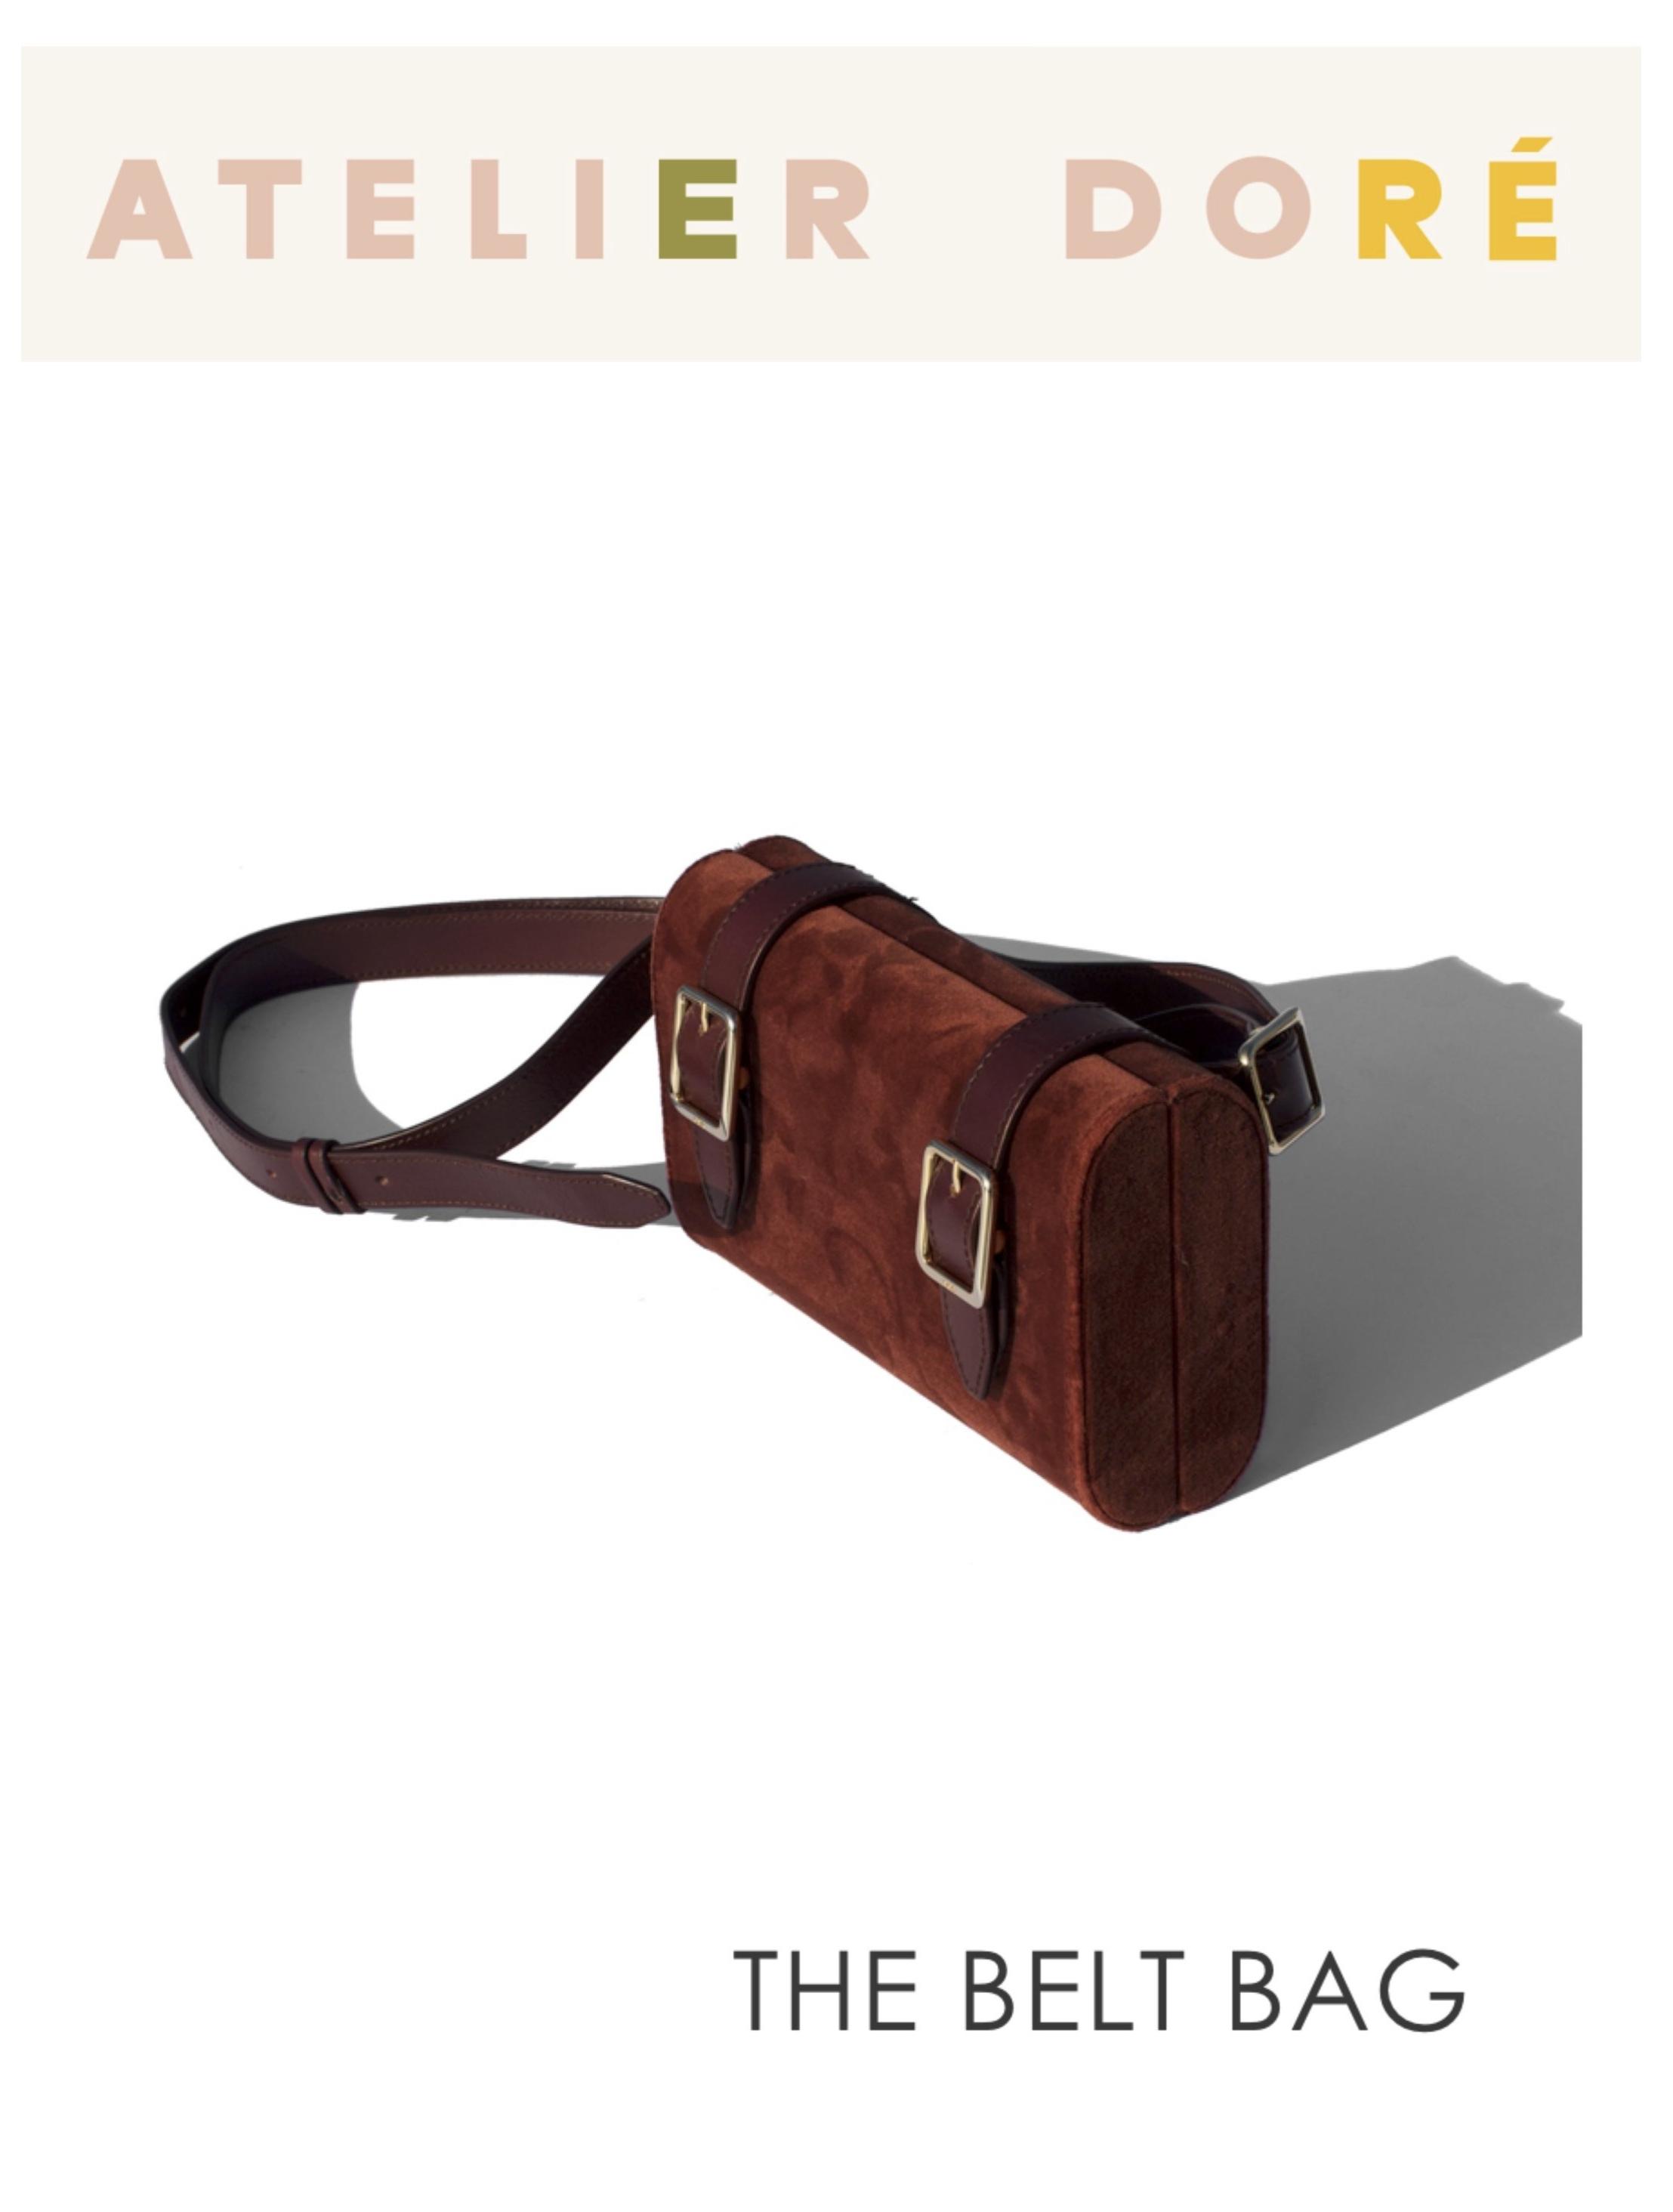 Atelier-Dore-Belt-Bag-ODP-Officina-del-Poggio